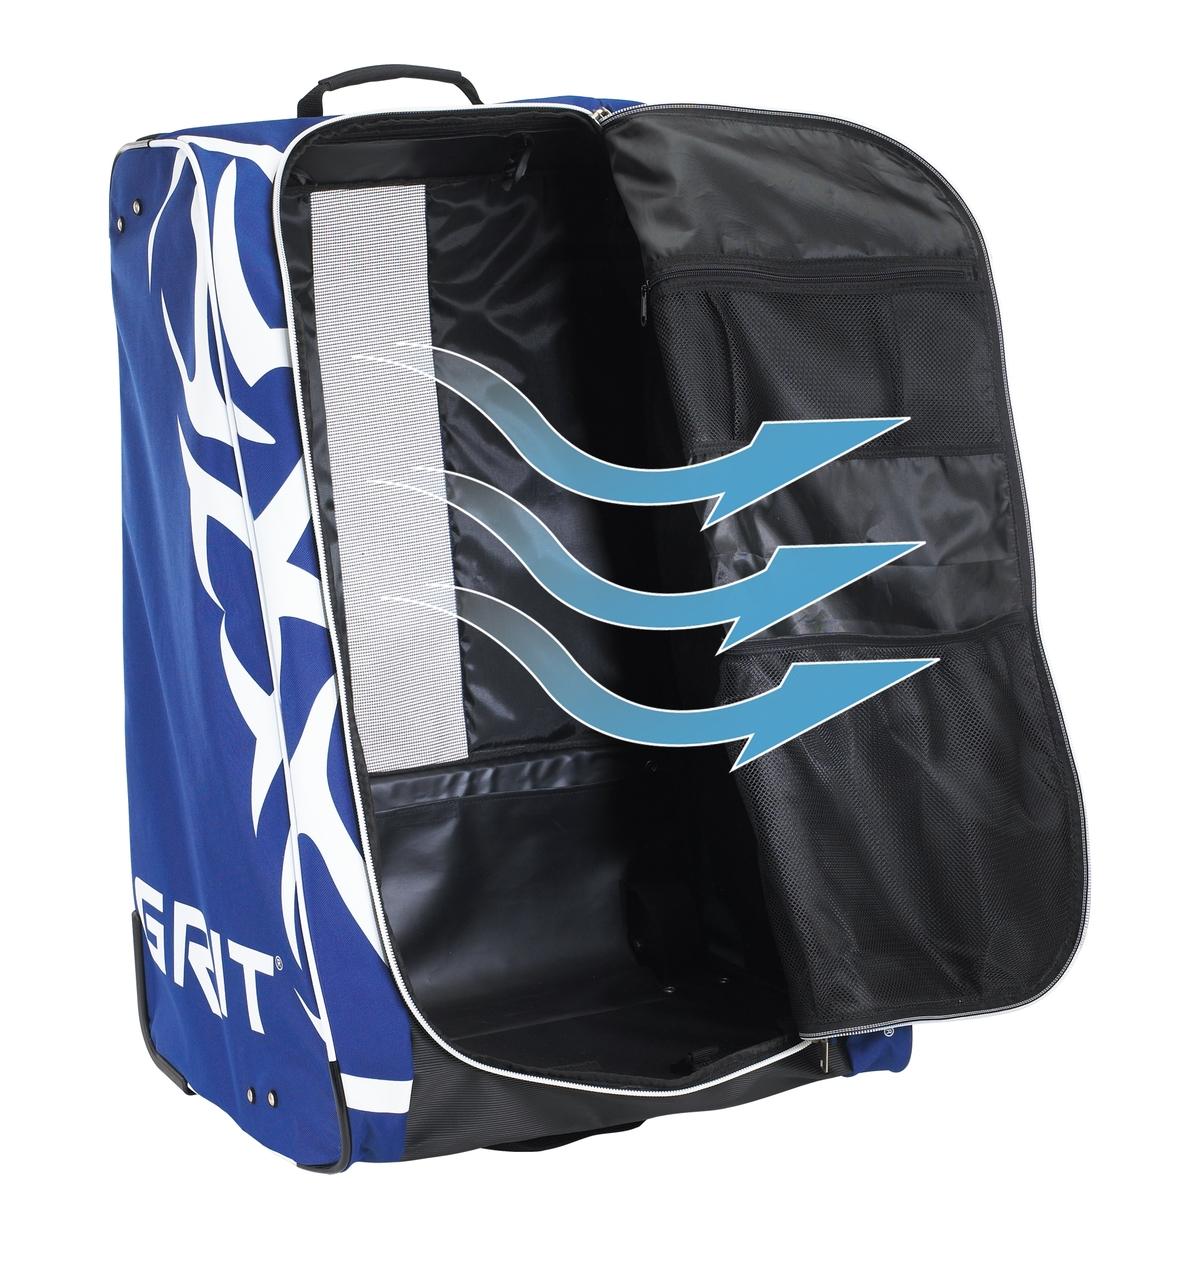 HYFX Junior Hockey Tower Bag